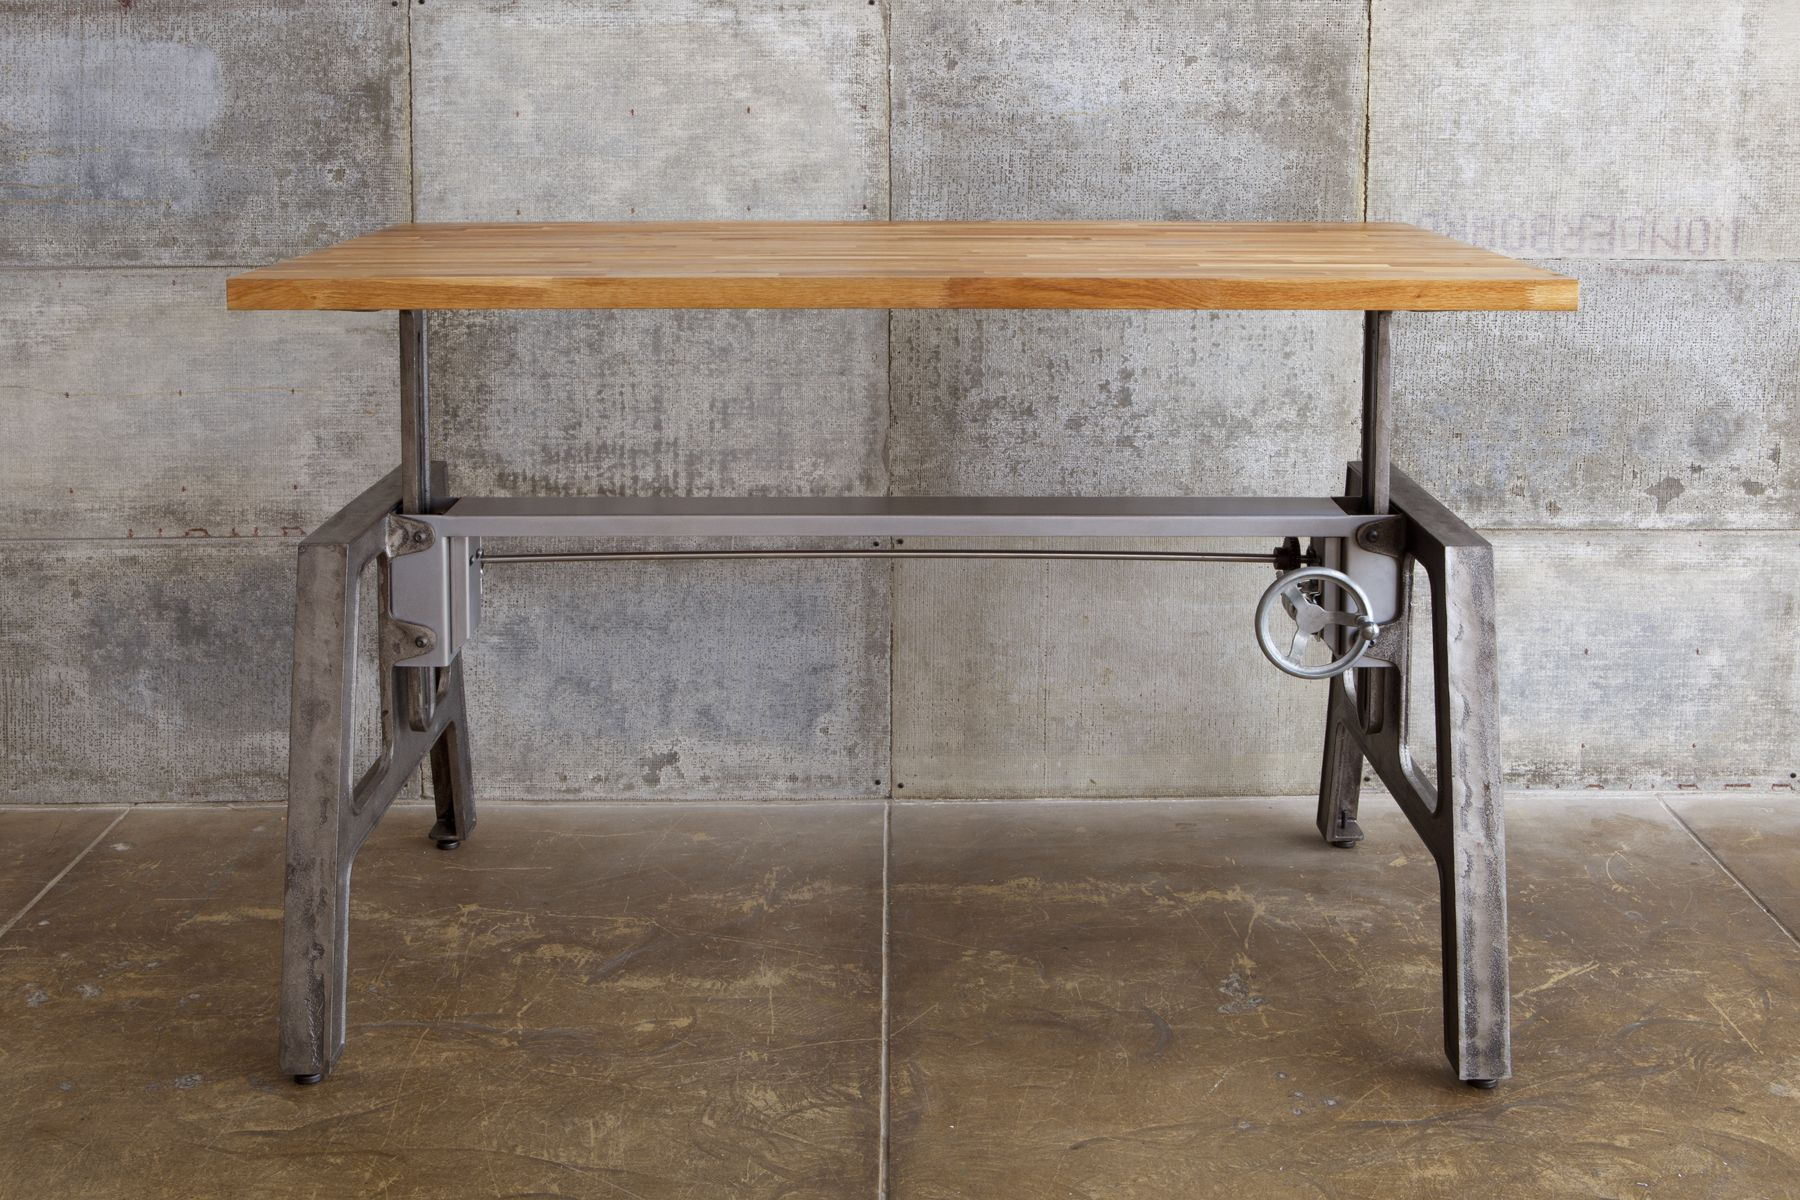 Discover The Best Mashstudios Height Adjustable Work Table On Dwell. Industrial  DeskIndustrial ...